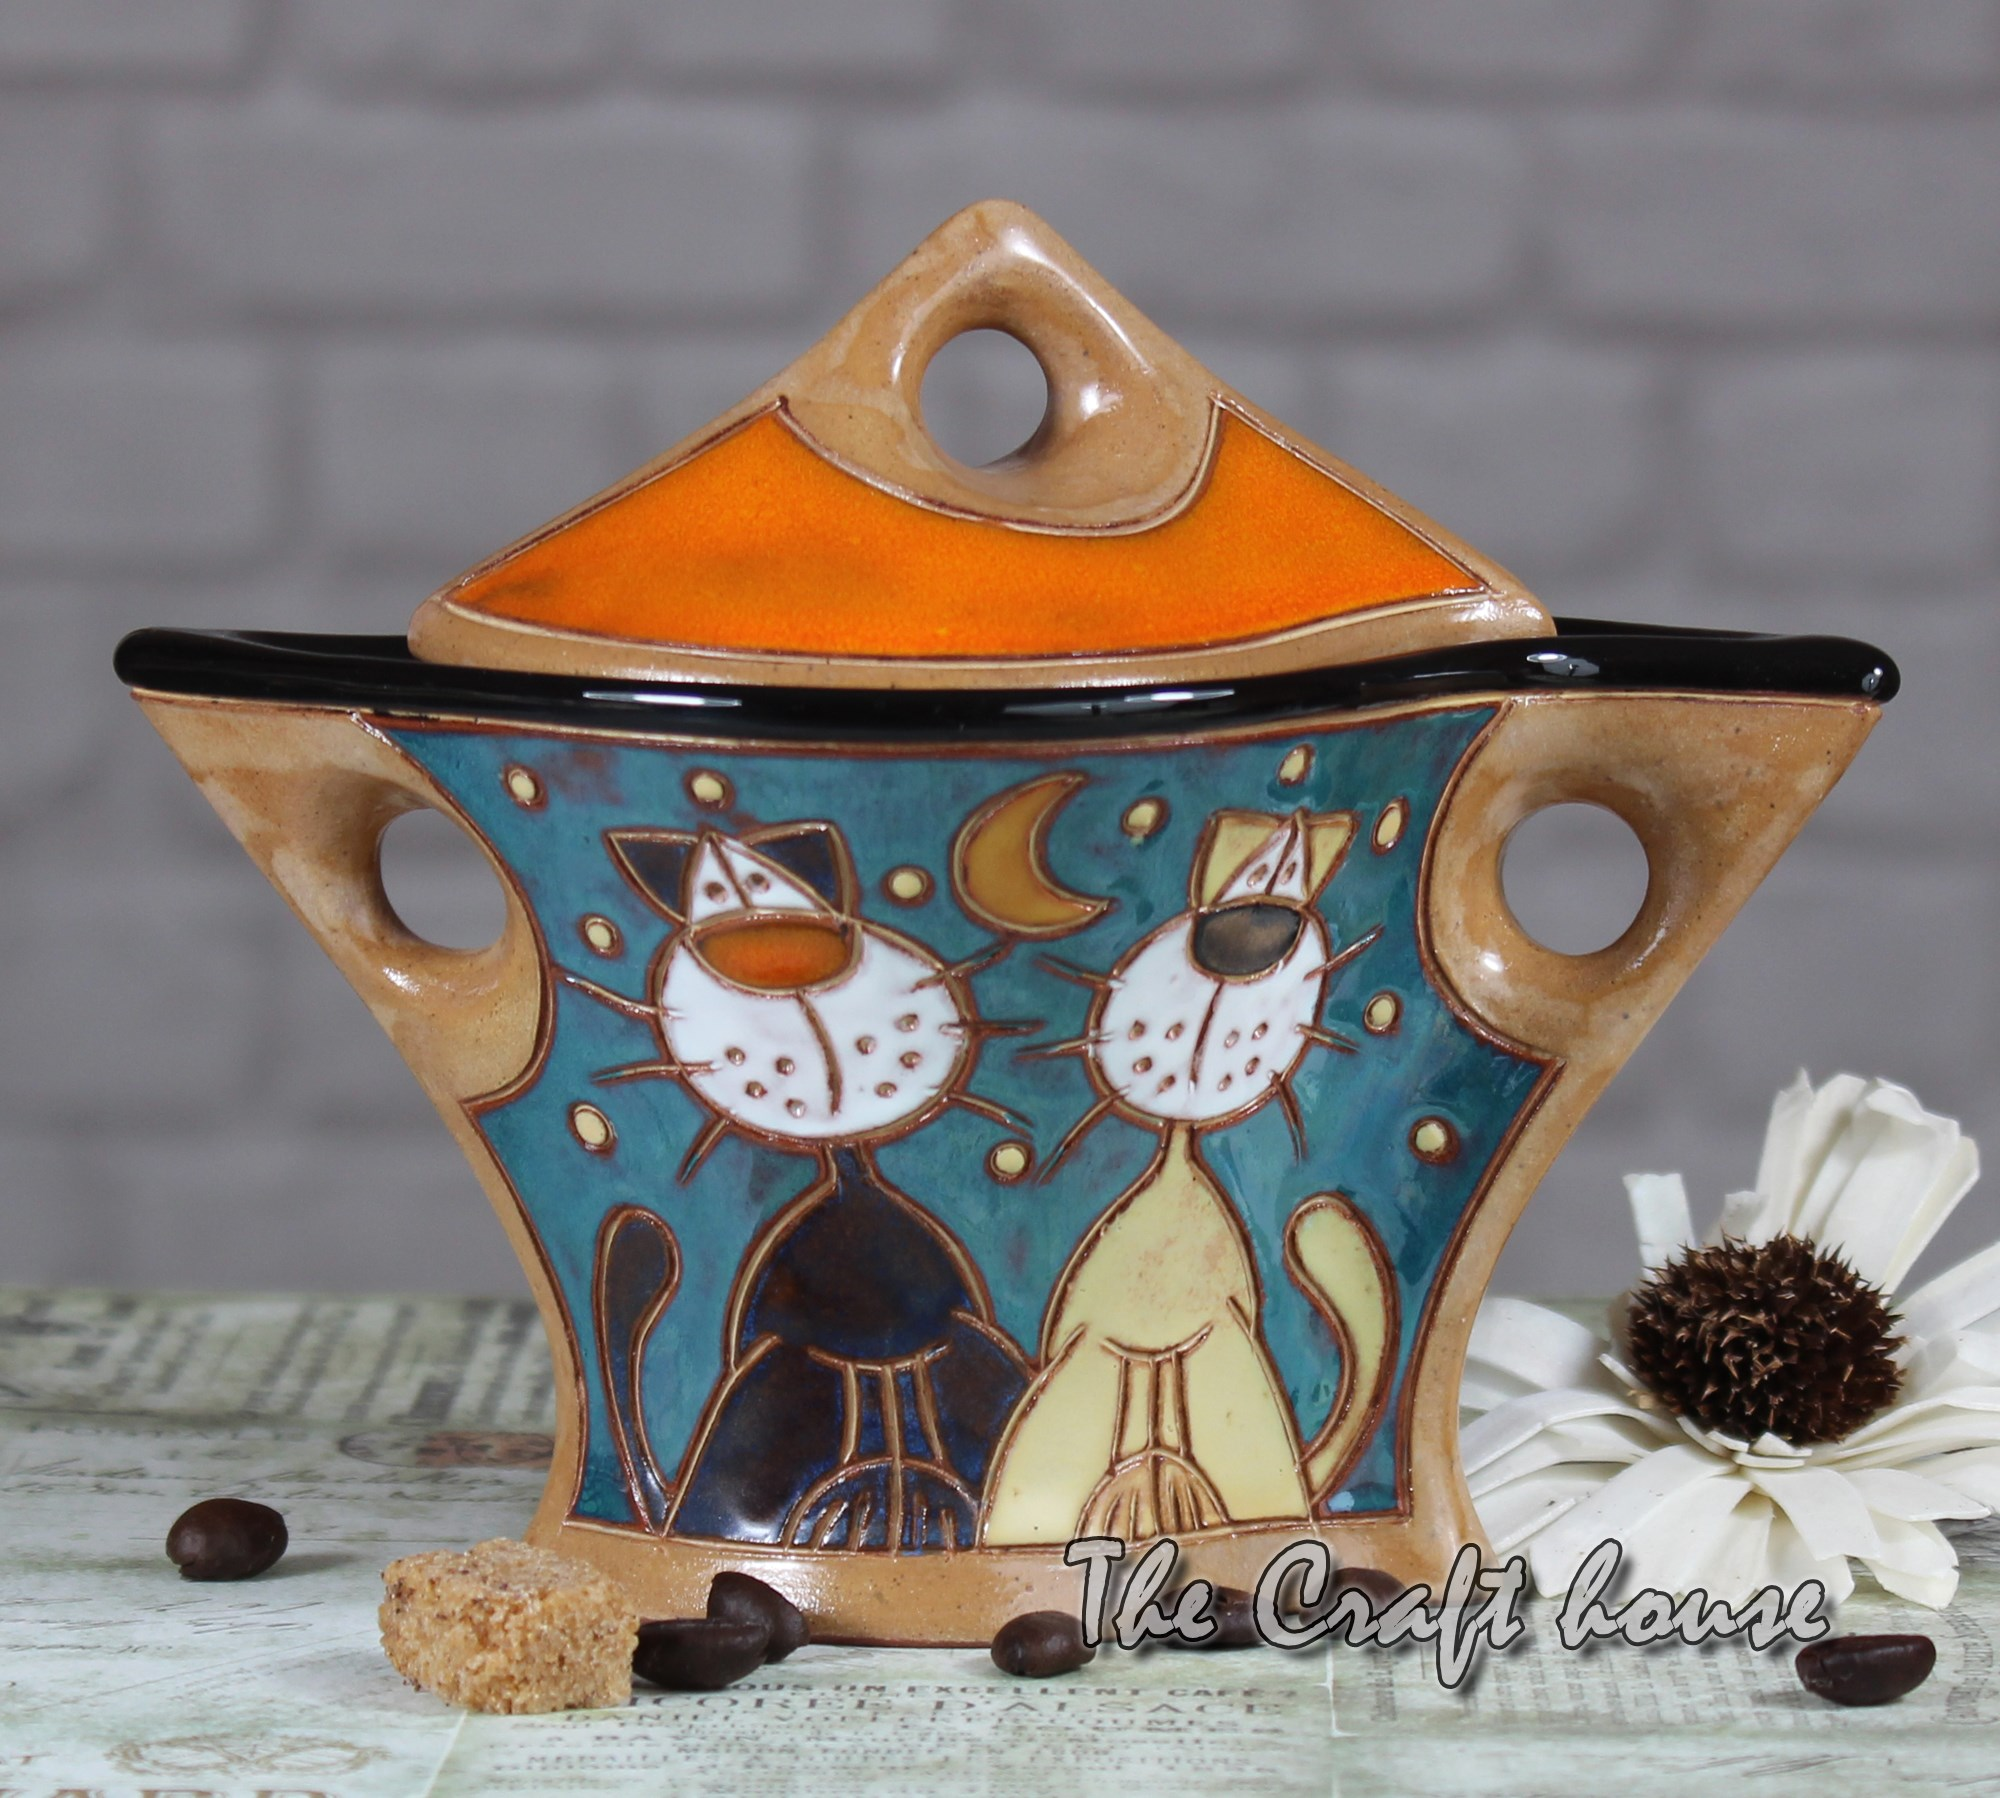 Ceramic sugar bowl 'Cats'